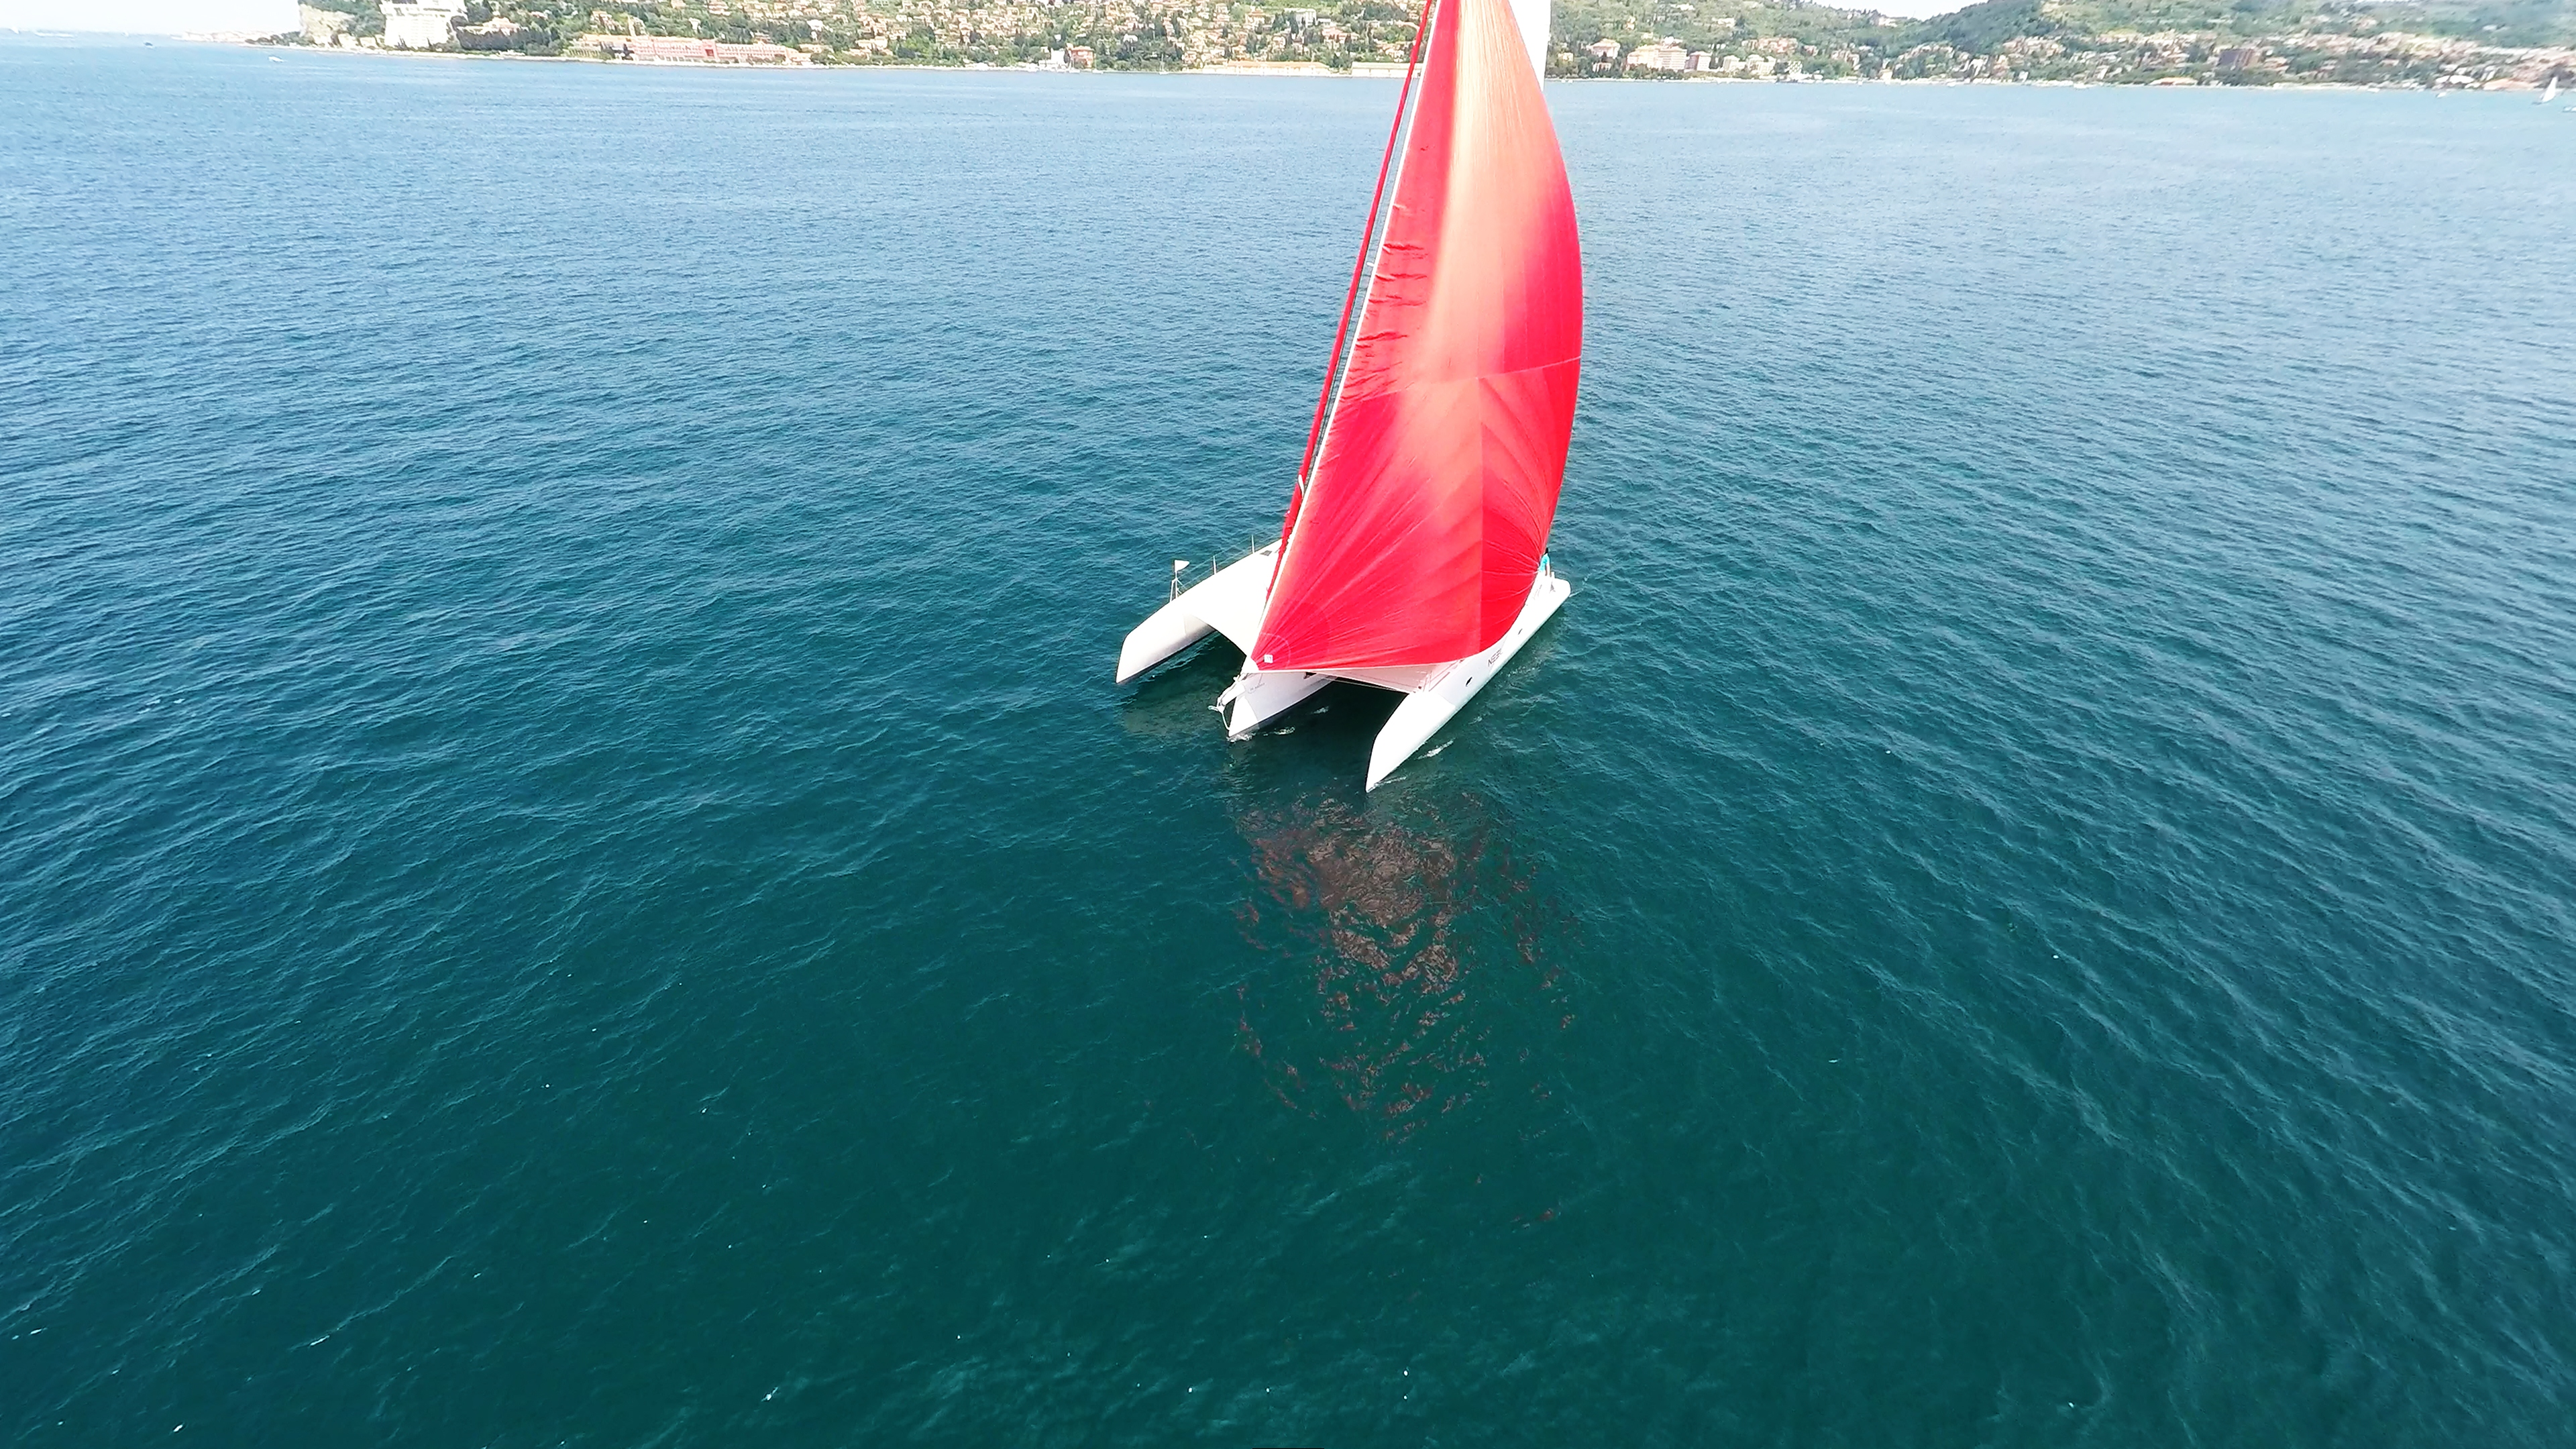 rosso spinnaker-gennaker bianco trimarano barca a vela blu mare